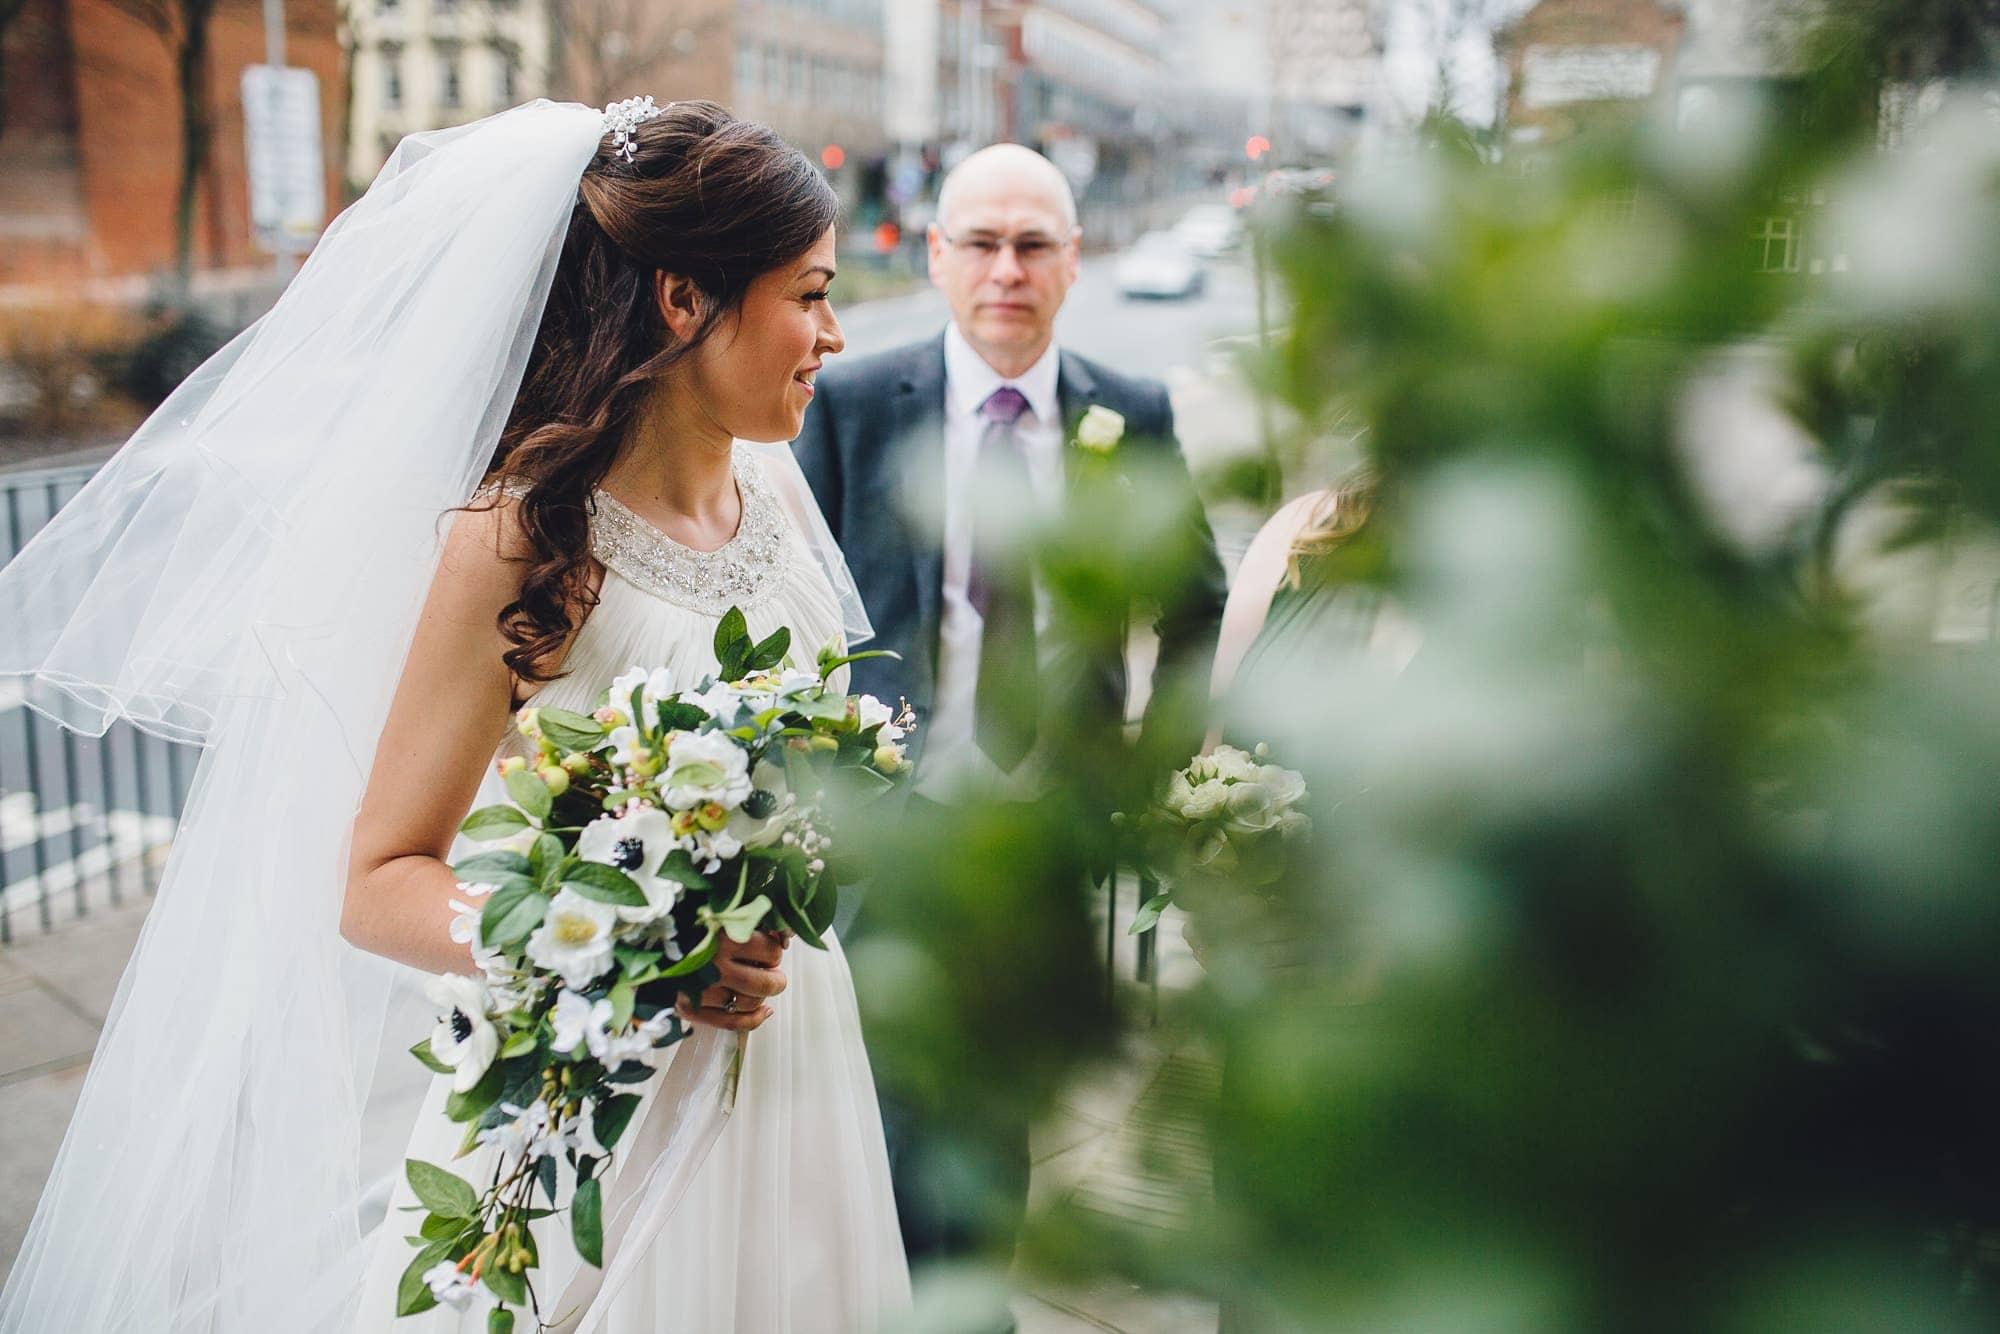 Matlt-Cross-Nottingham-wedding-Photography-23